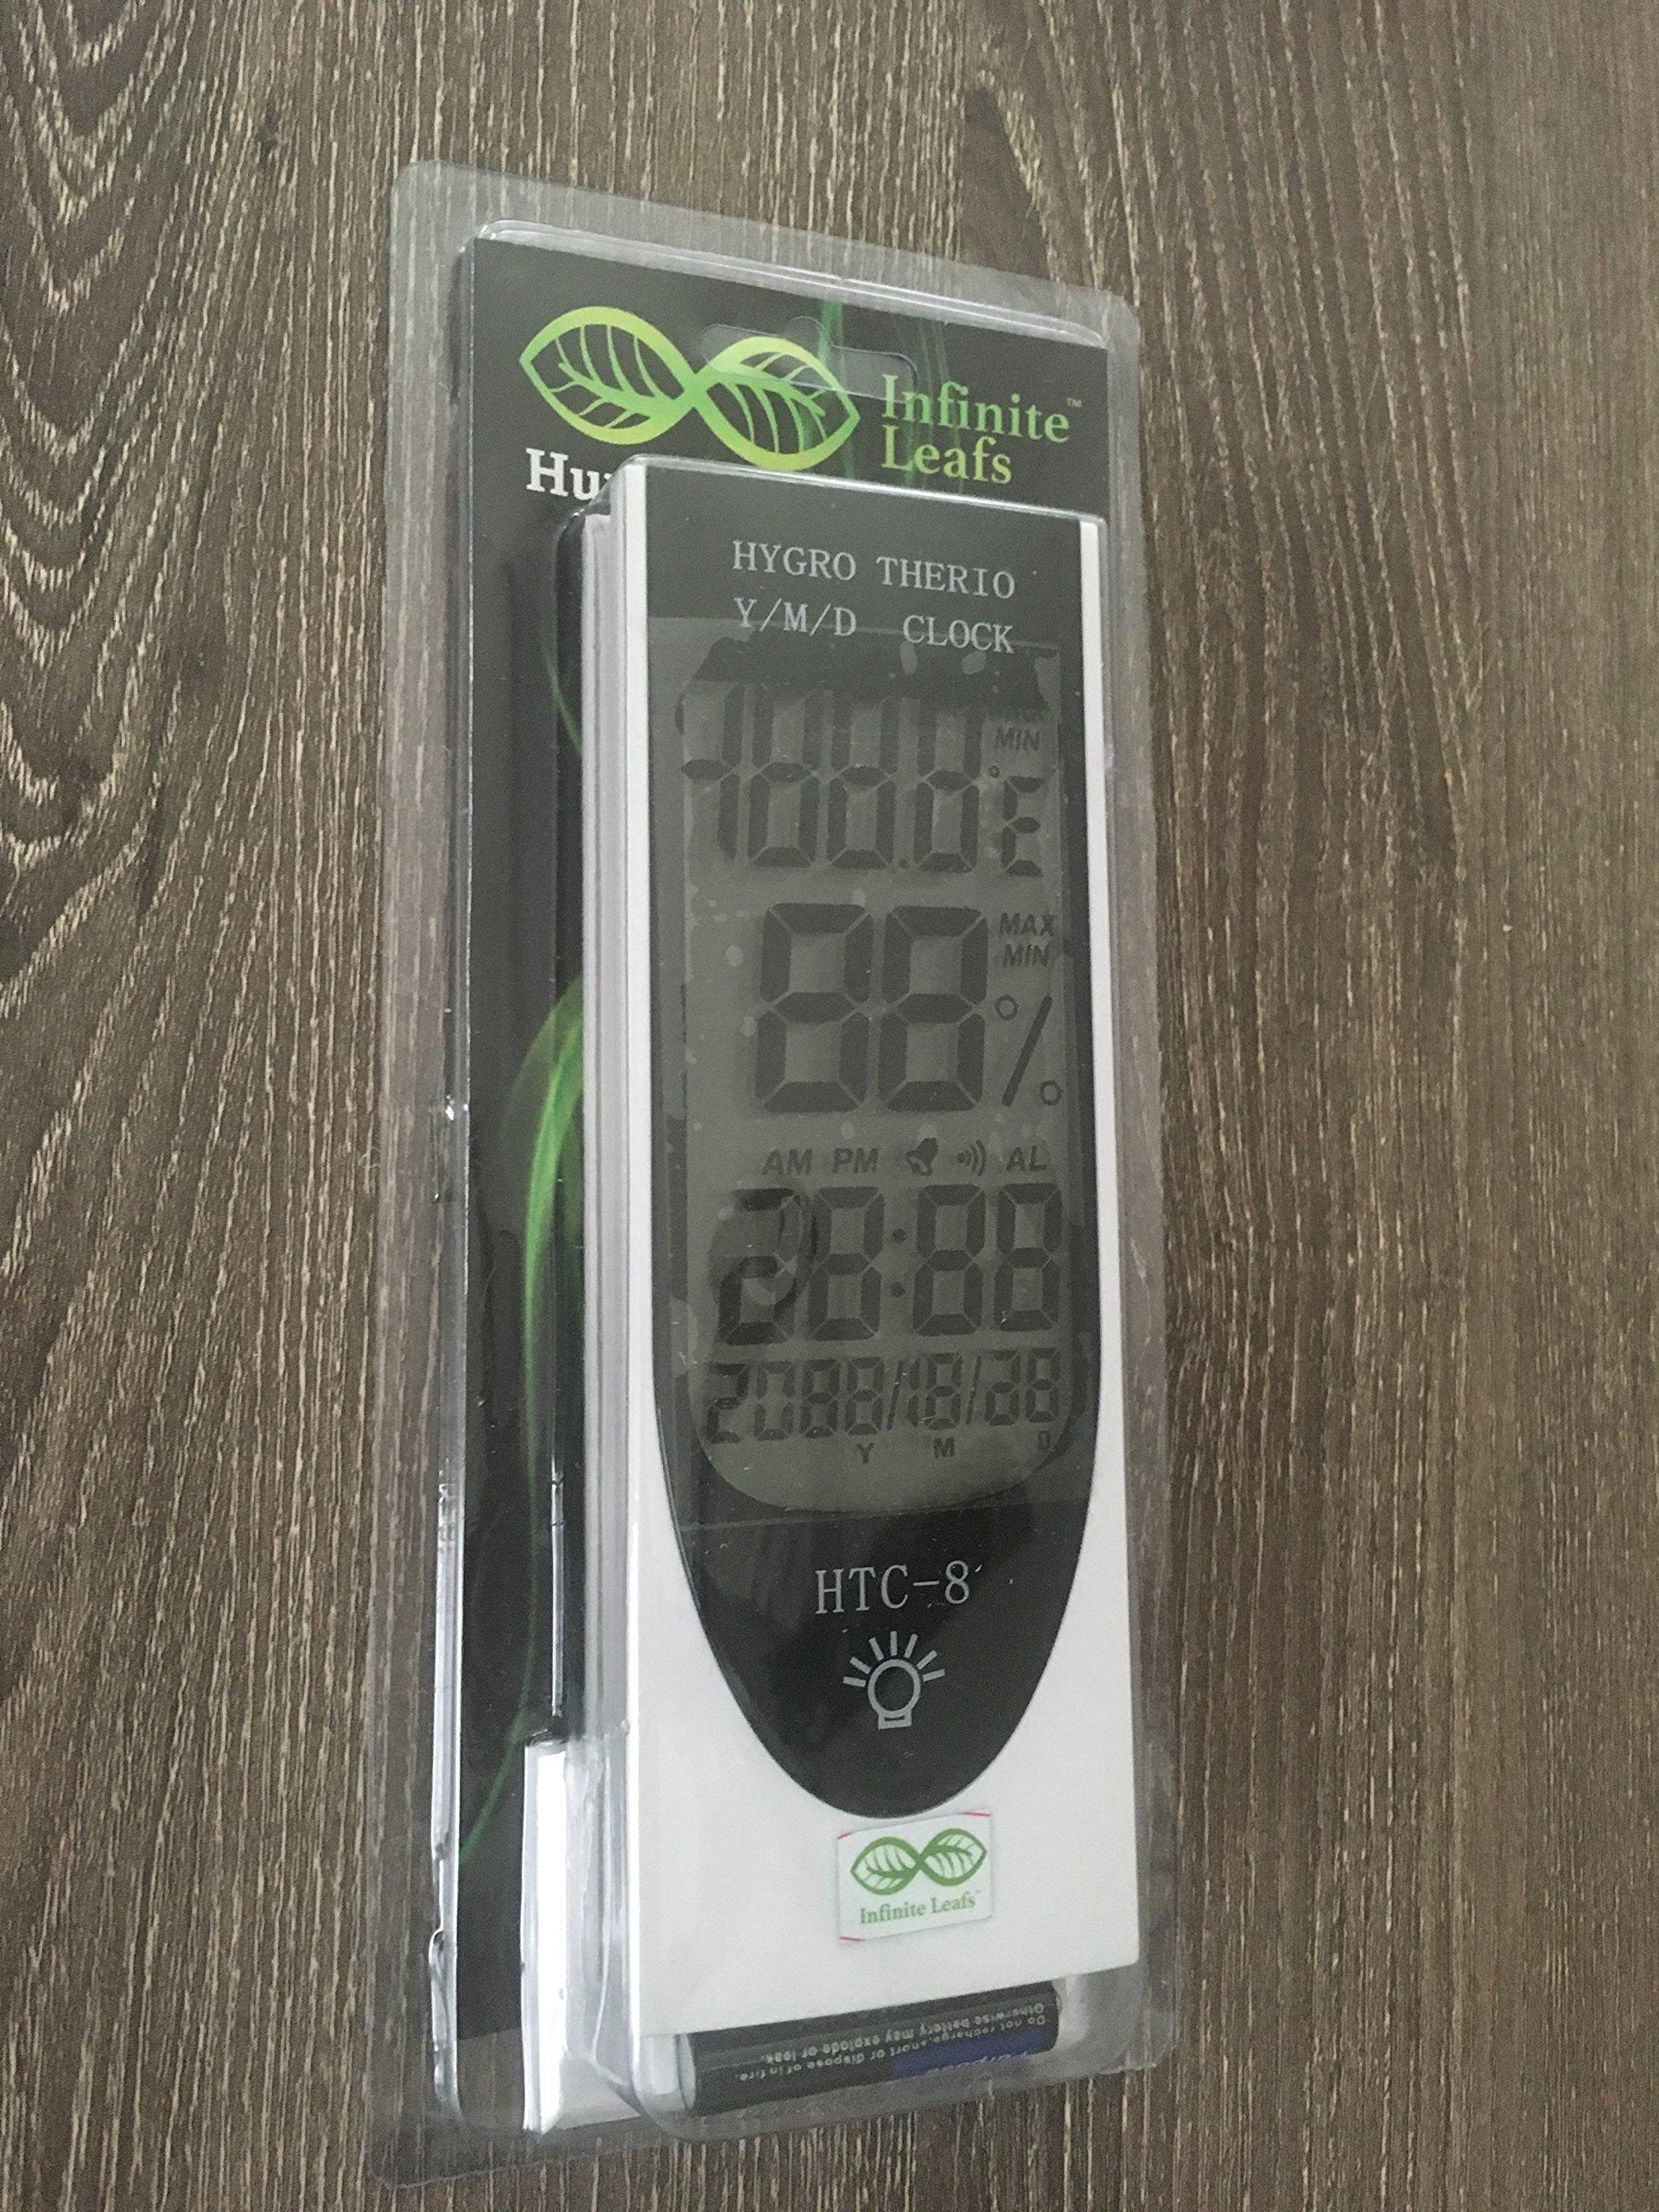 Digital Blue LED light Sensor, Hygrometer, Temperature, Humidity Meter, Clock, Calendar, Alarm, Hydroponics.